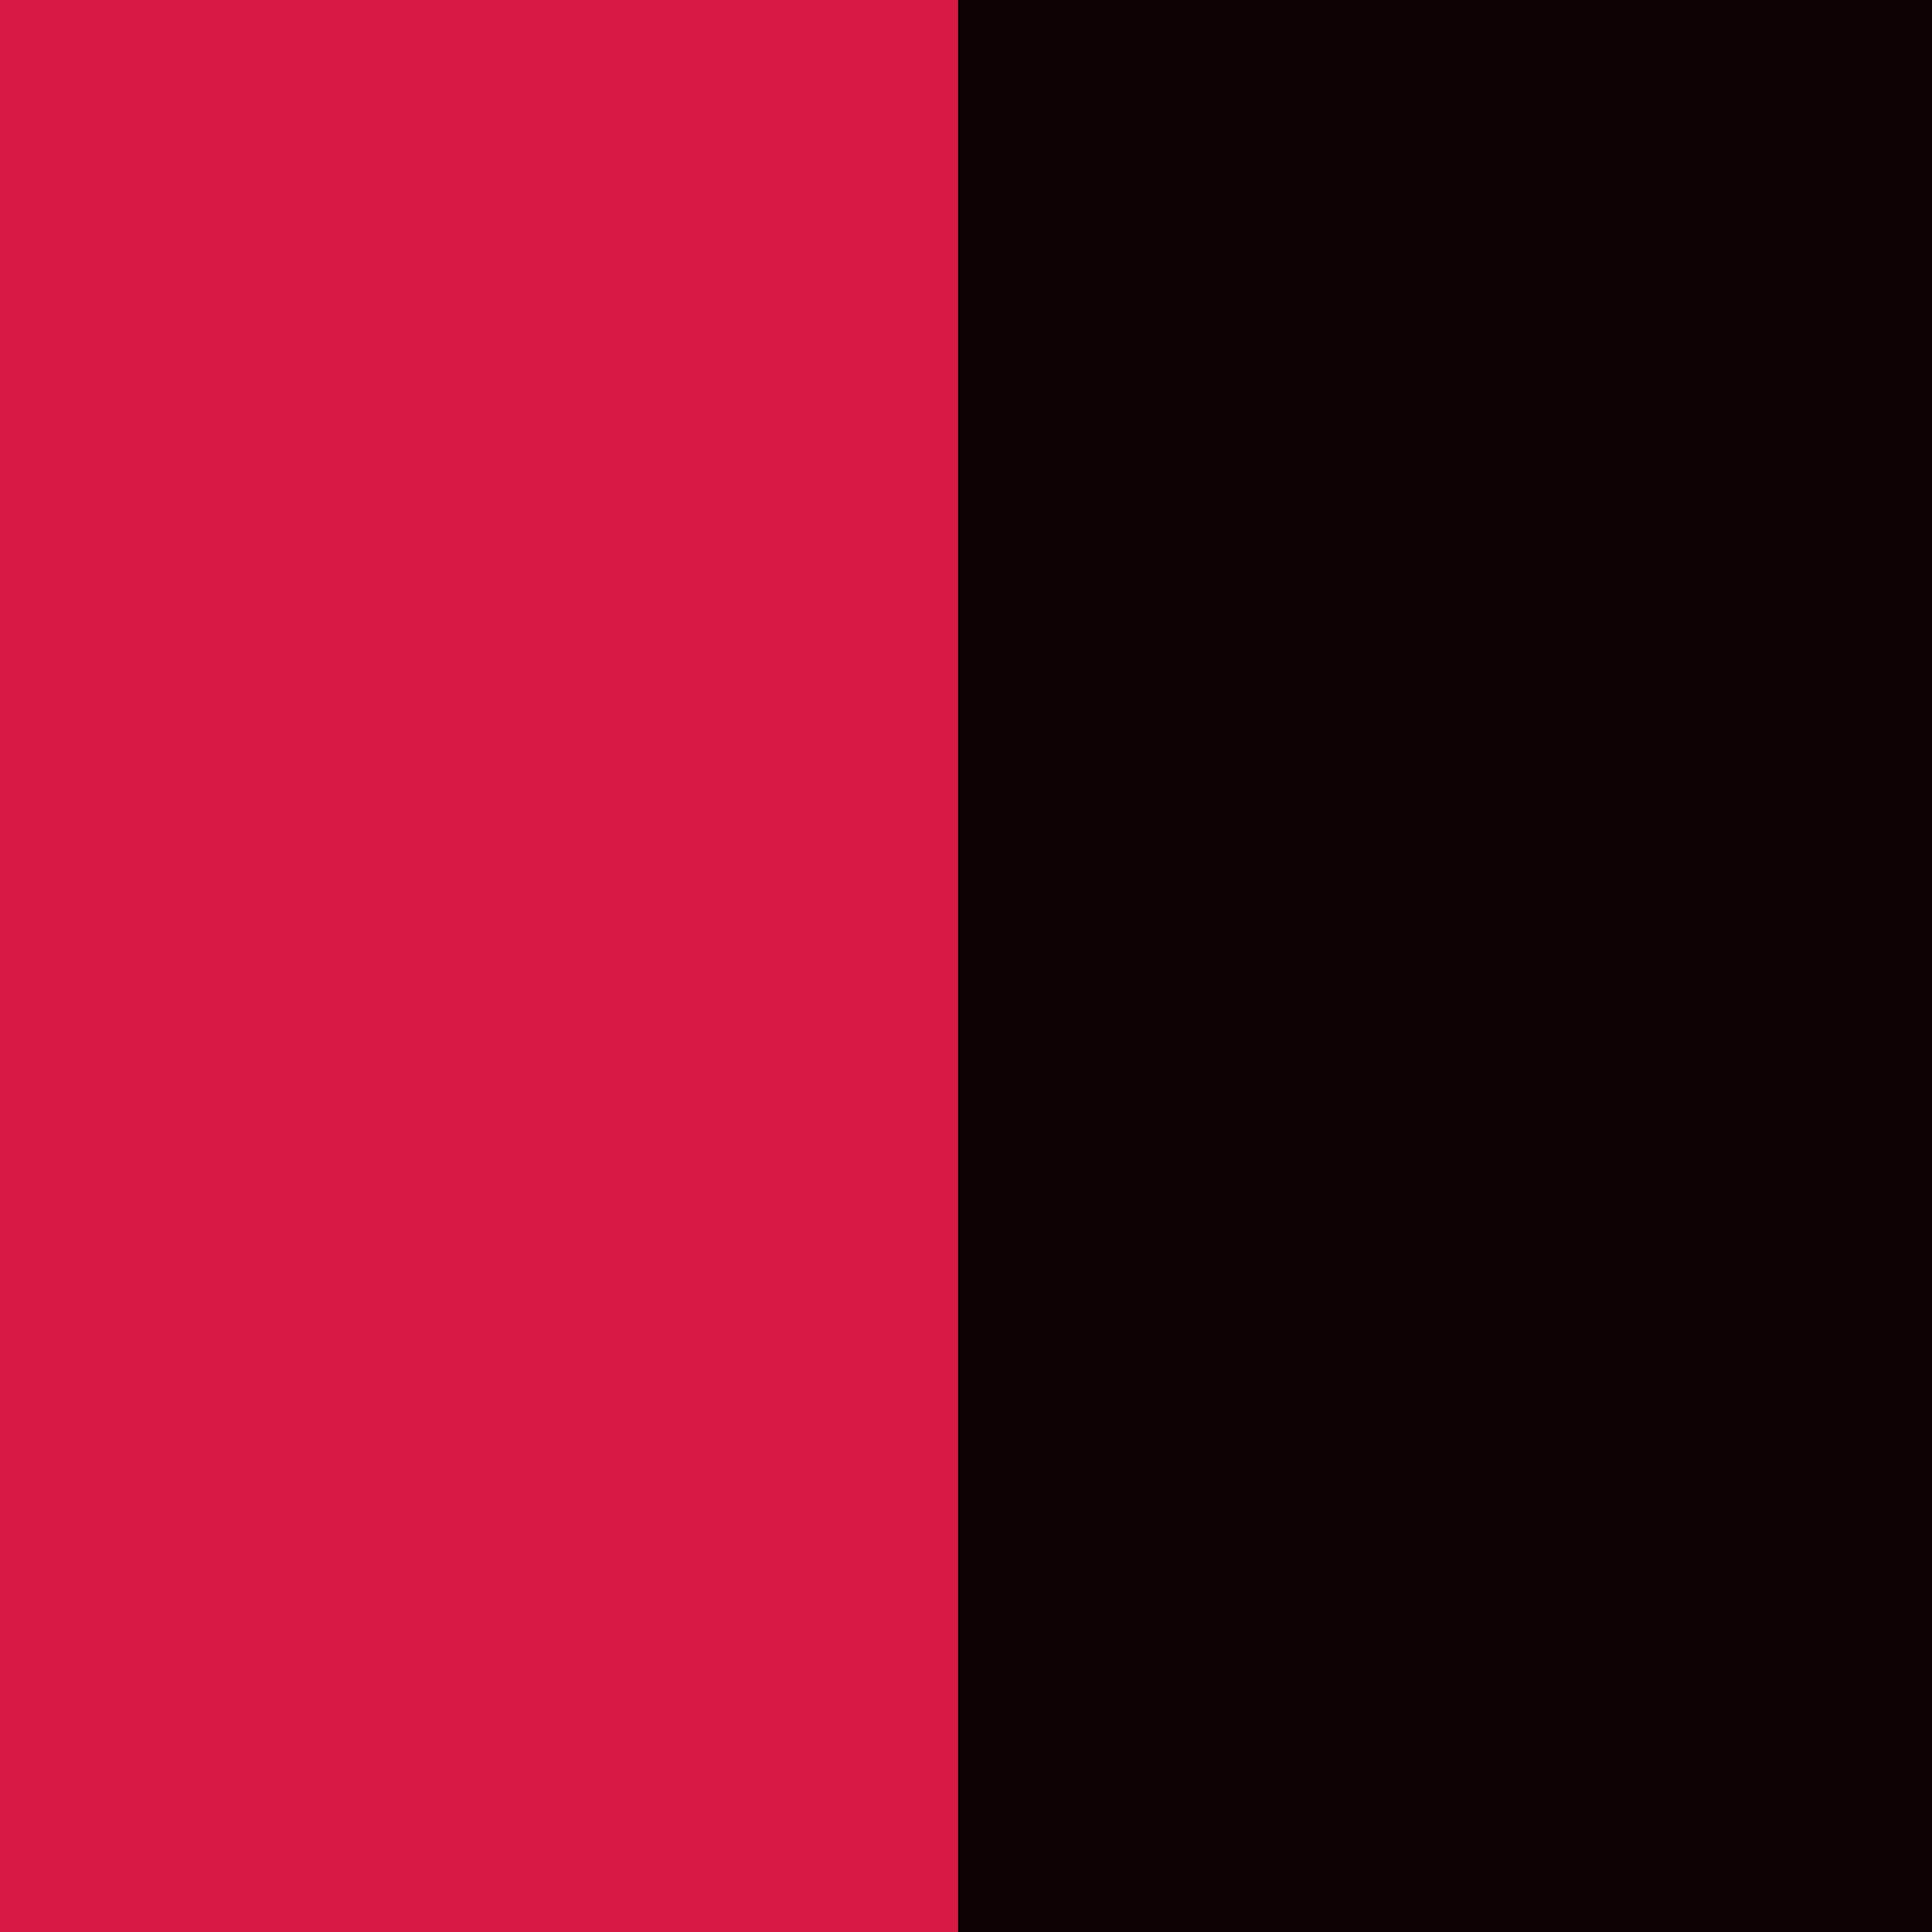 red+black